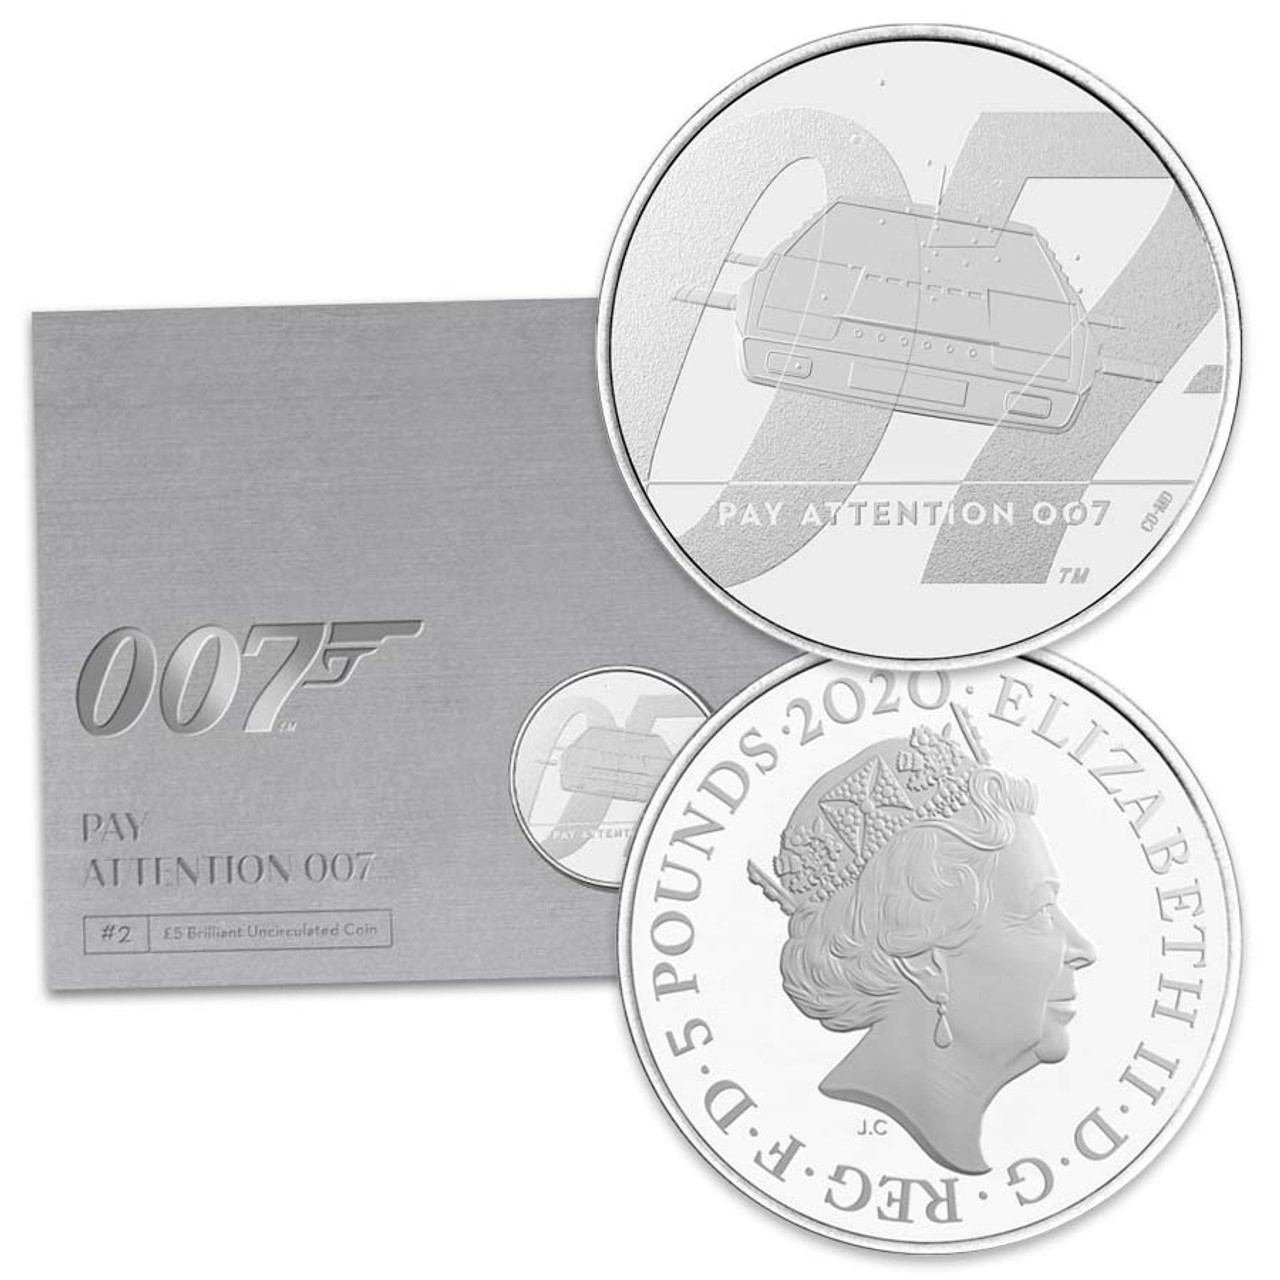 Great Britian 2020 James Bond Wet Nellie Copper-Nickel £5 Brilliant Uncirculated